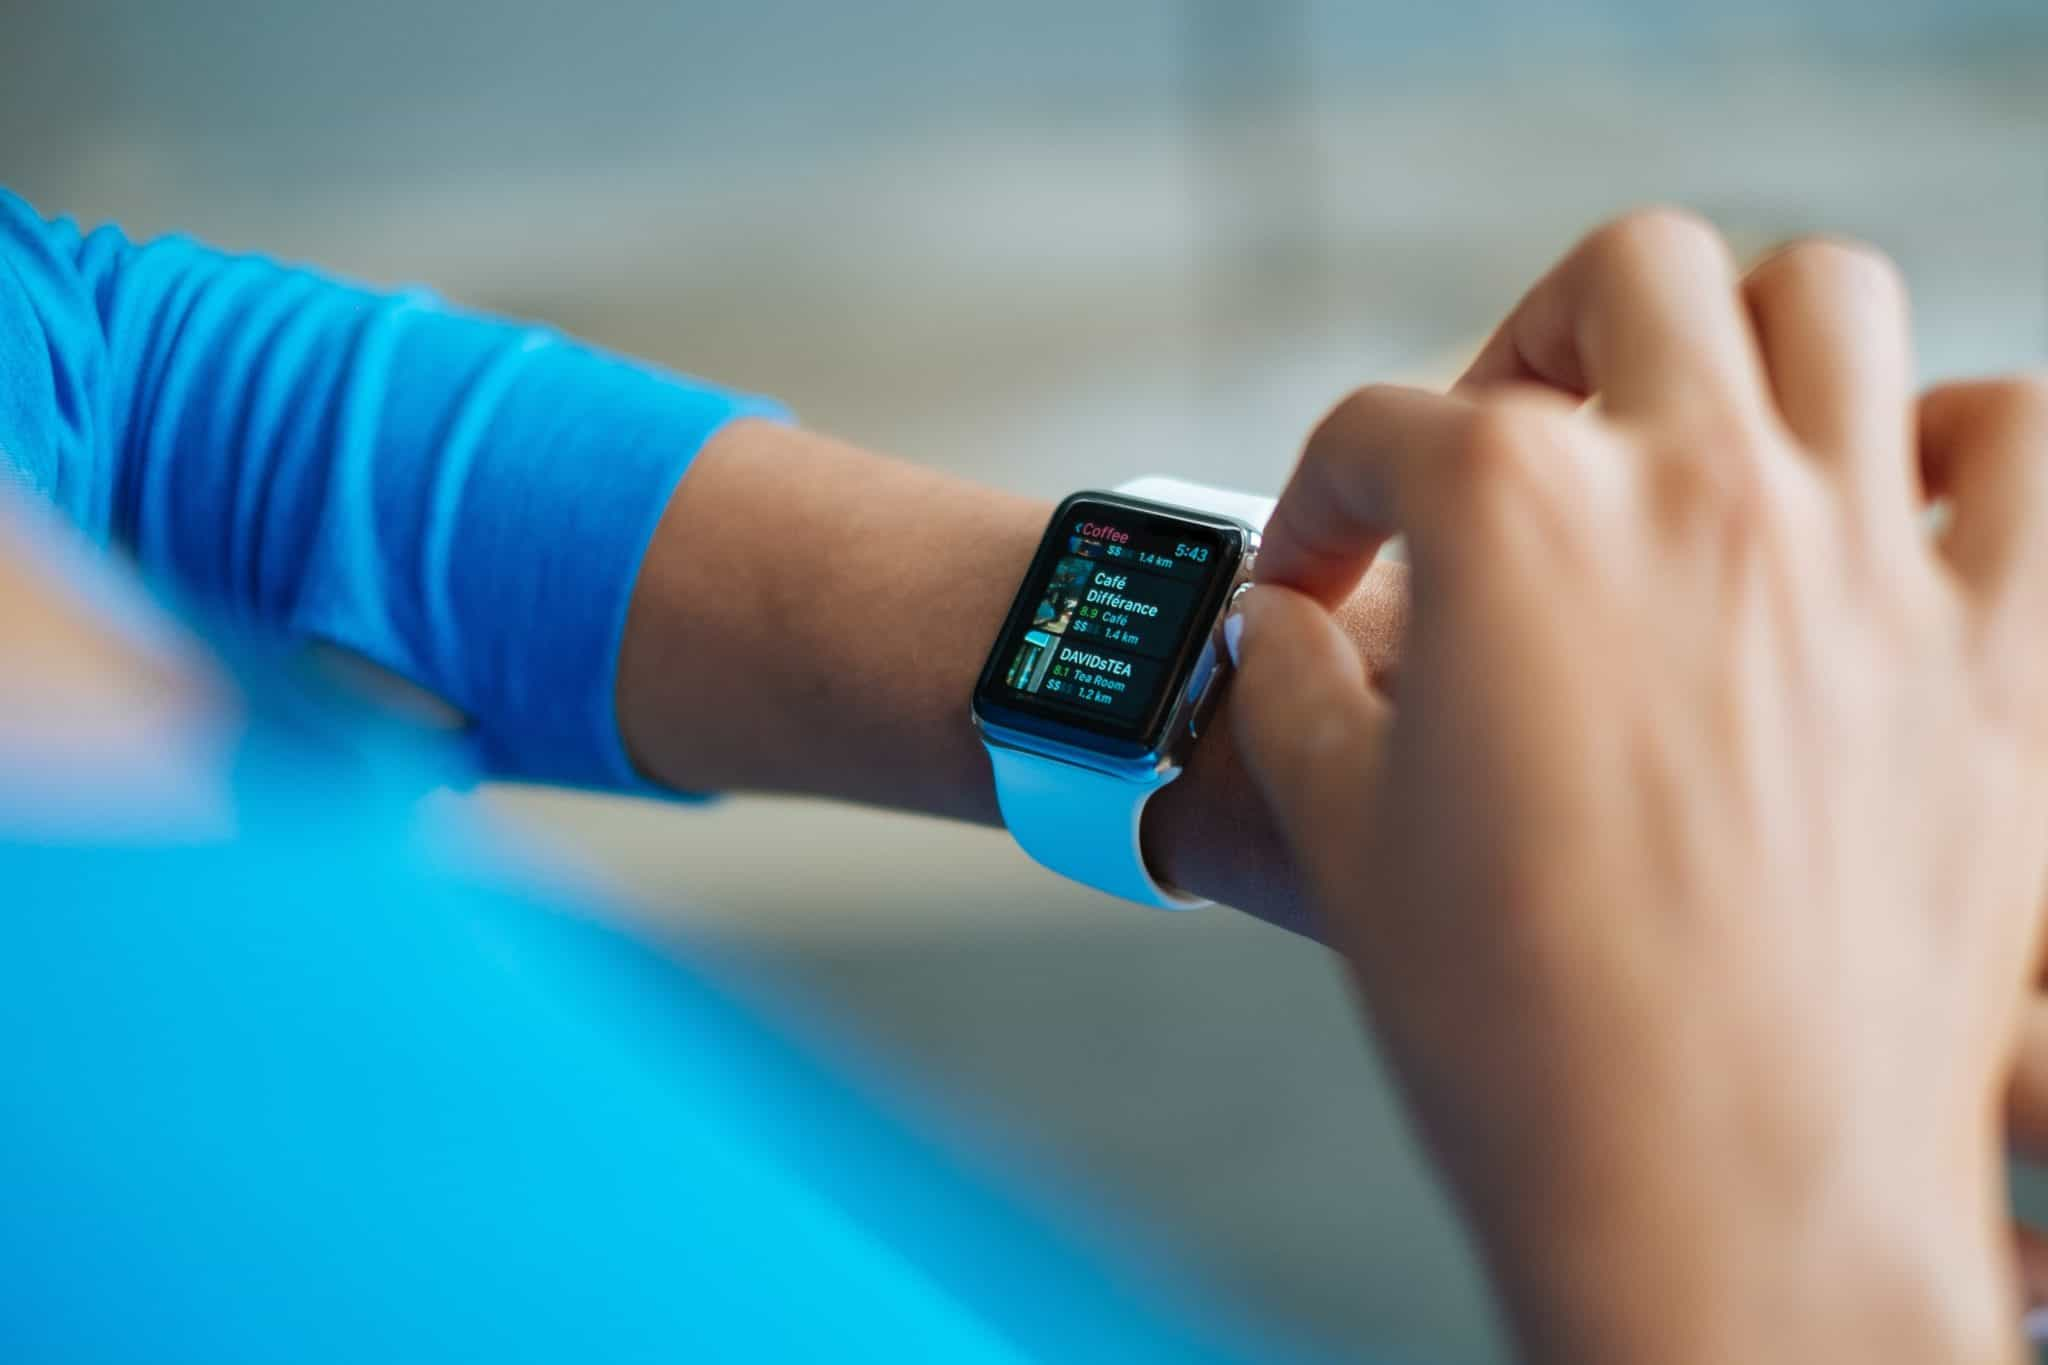 apple-apple-watch-gadget-267391